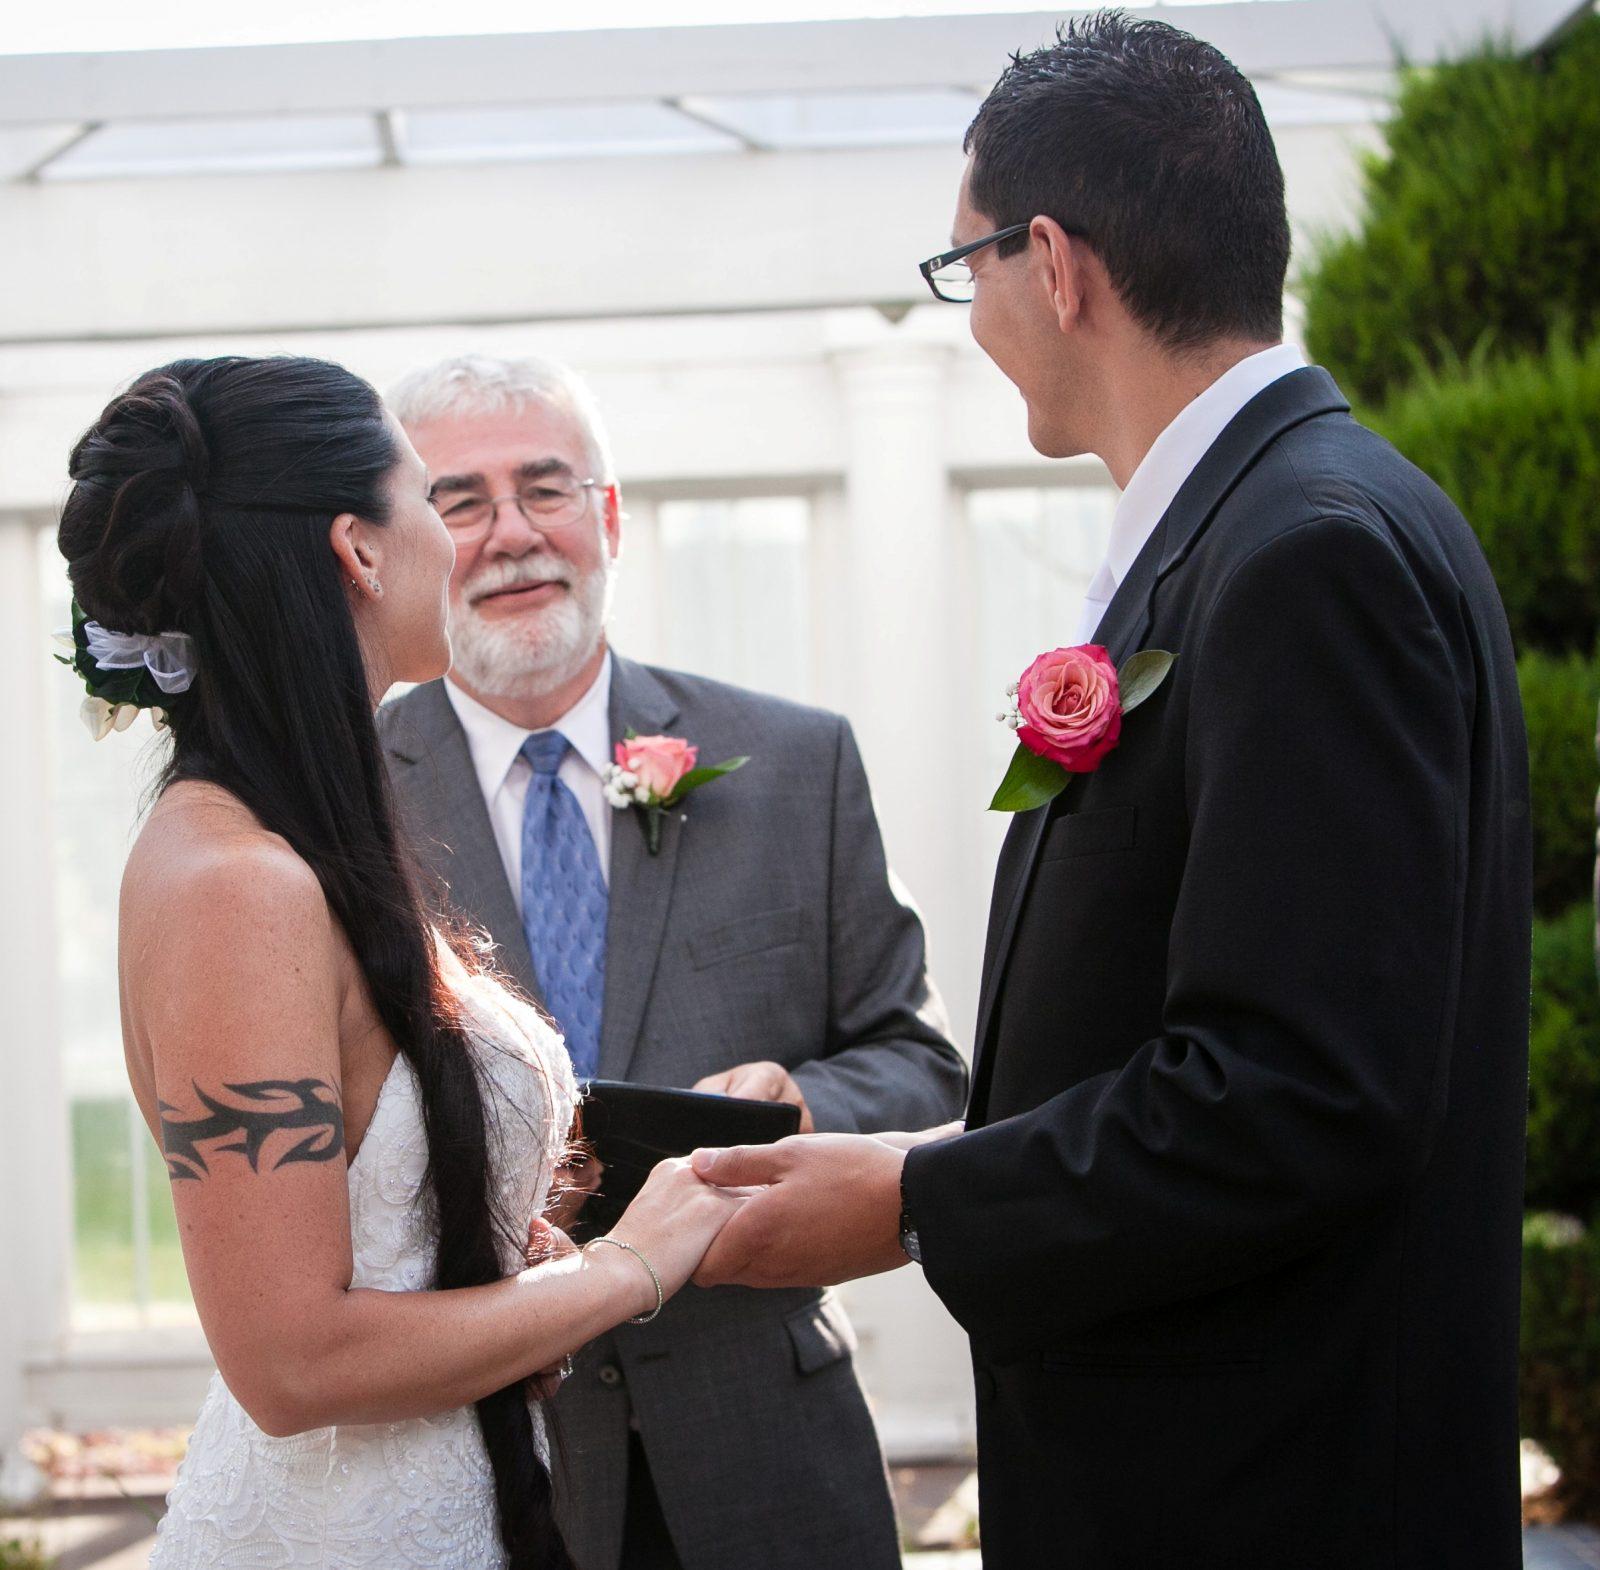 wedding officiant, wedding ceremony